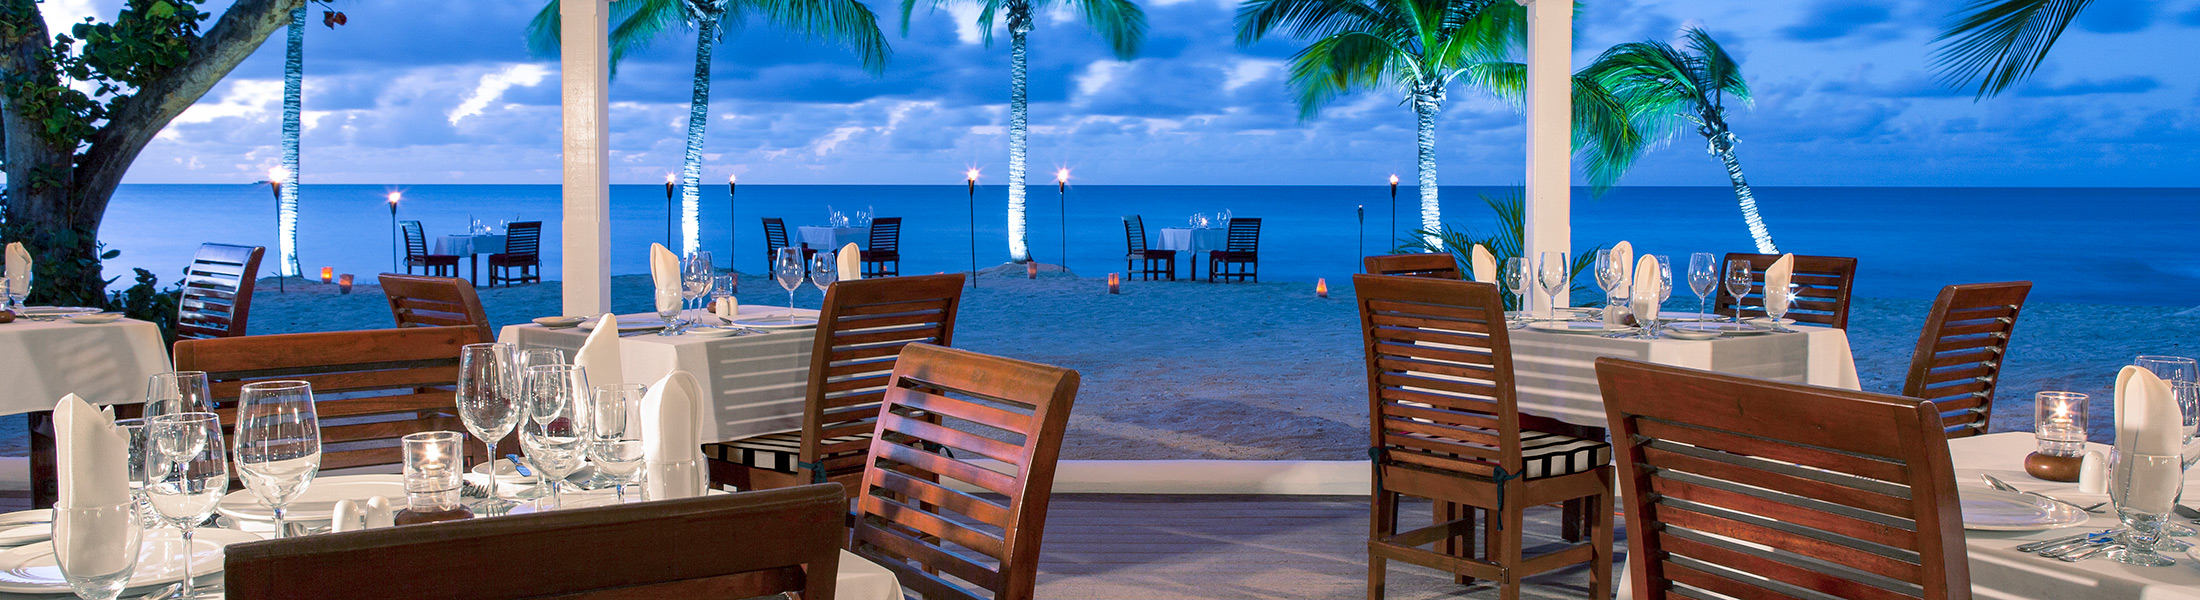 Outdoor dining at sunset at Galley Bay Resort & Spa